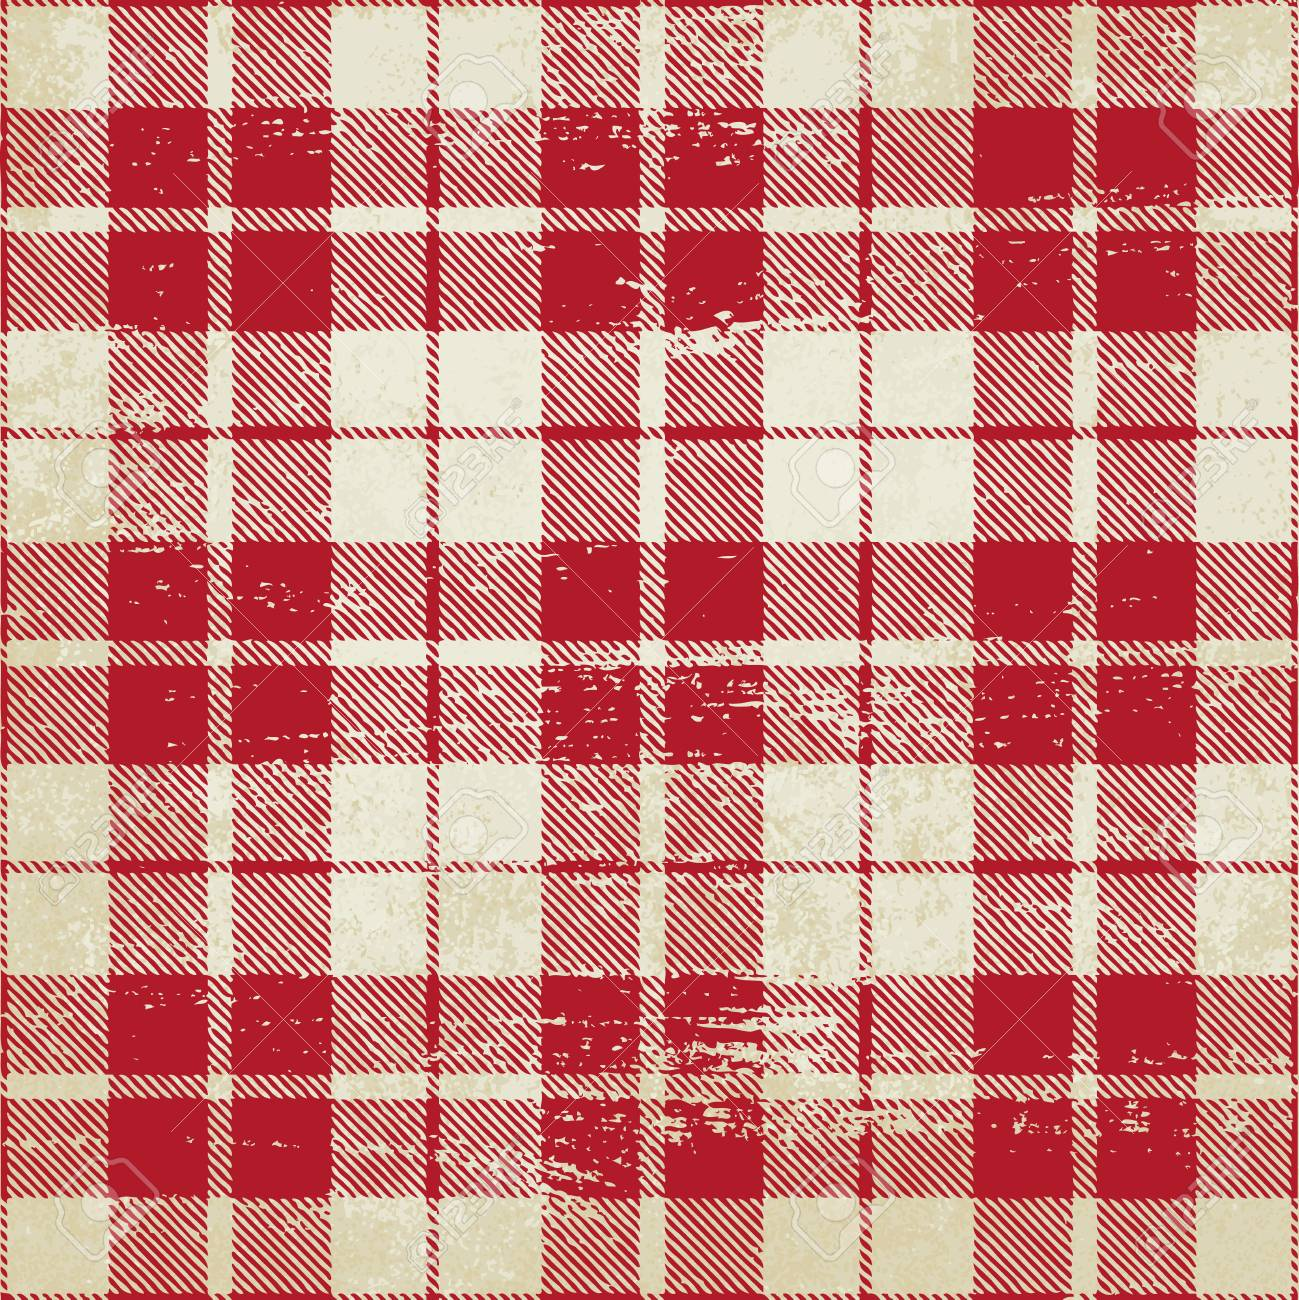 Tartan inspired vintage vector background 2 - 106377502